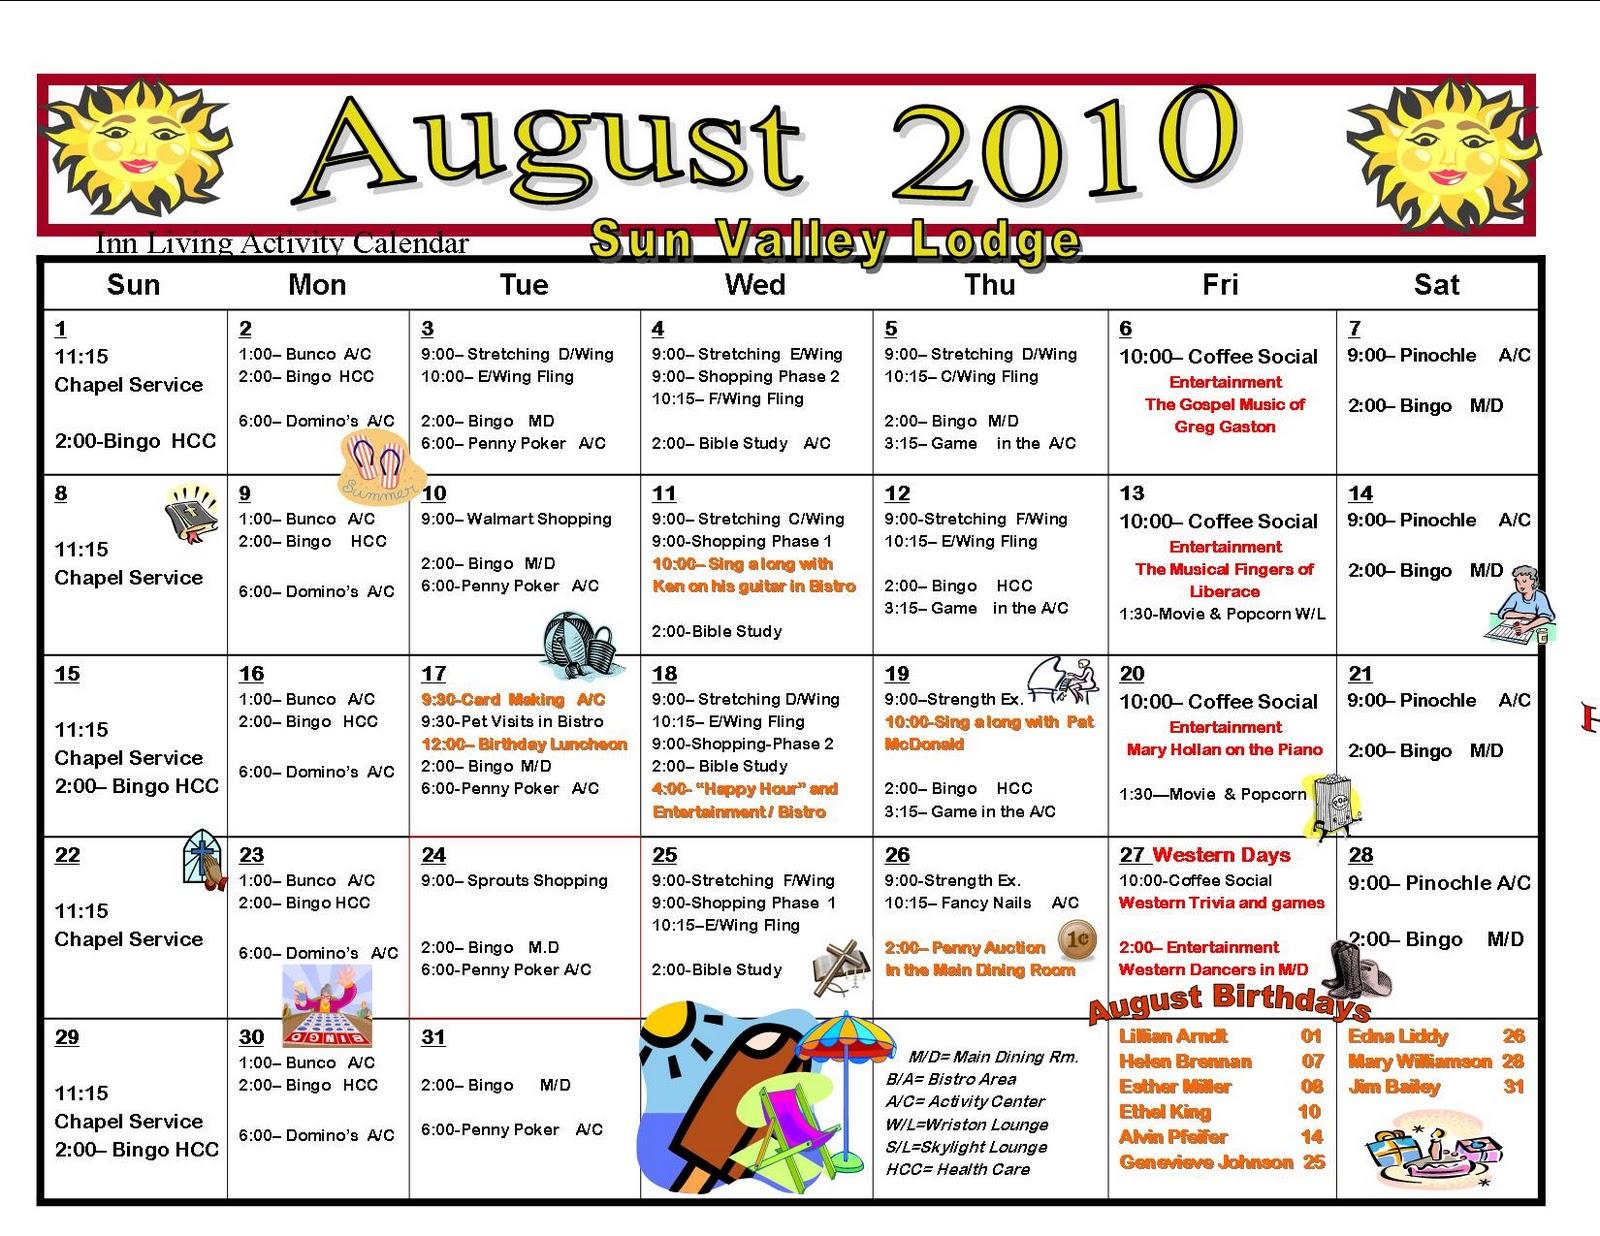 assisted living activity calendar template activities director nursing home activities ideas autos post